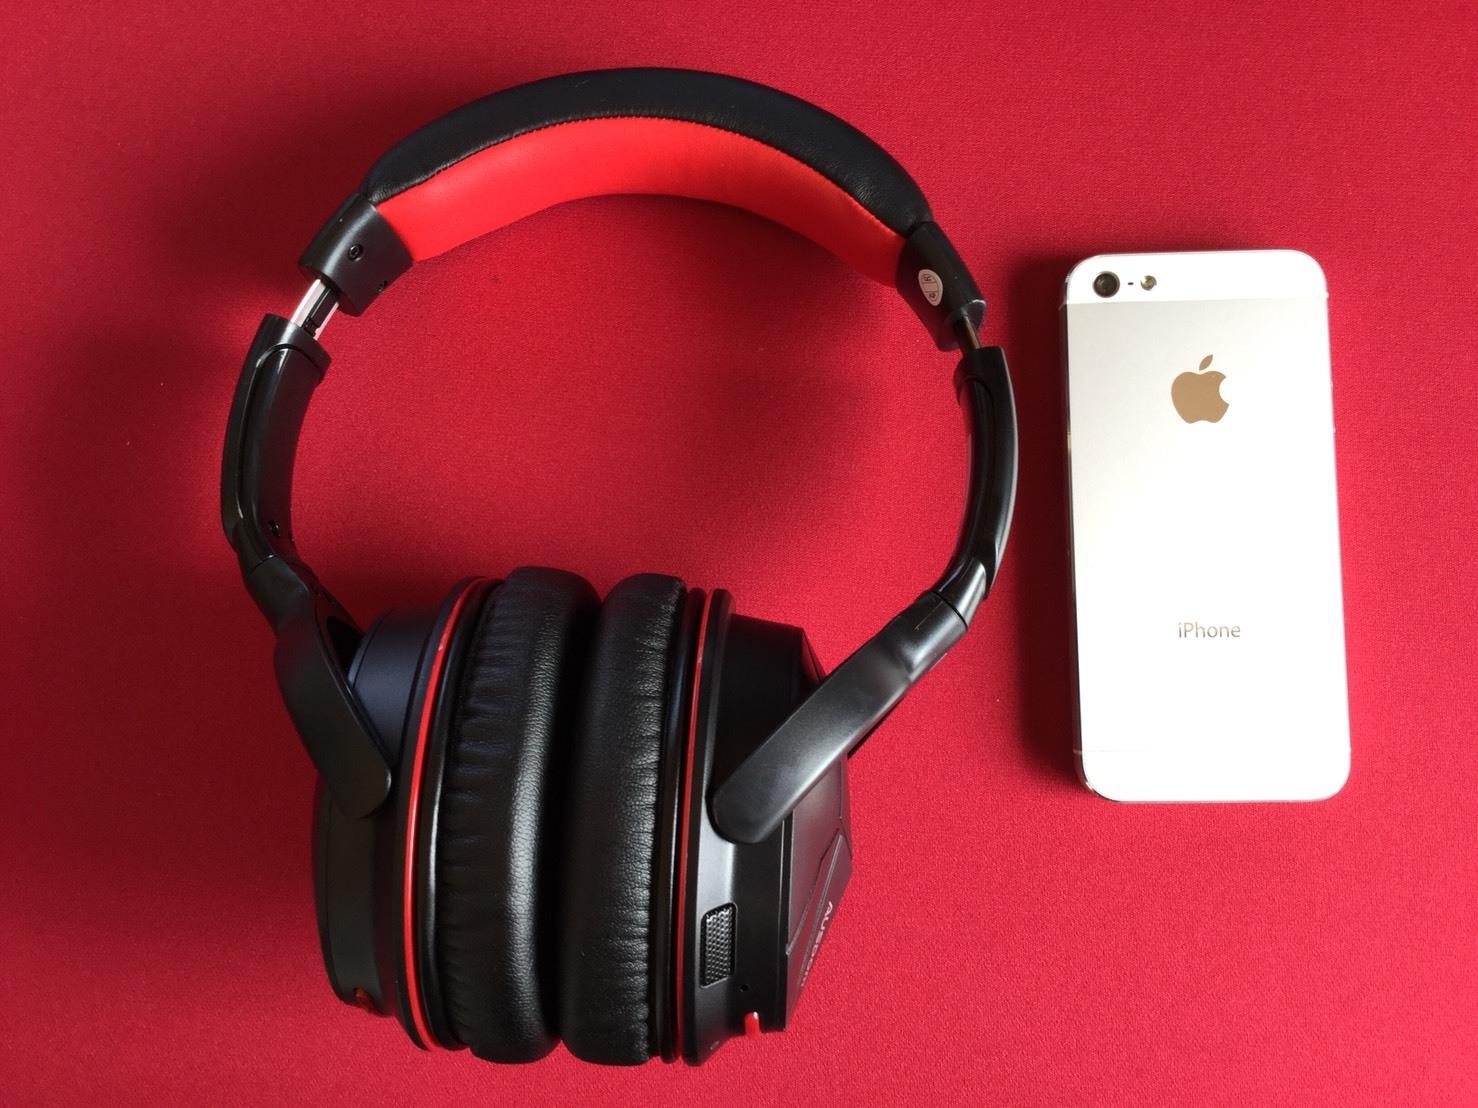 Bluetoothのヘッドホン13比較